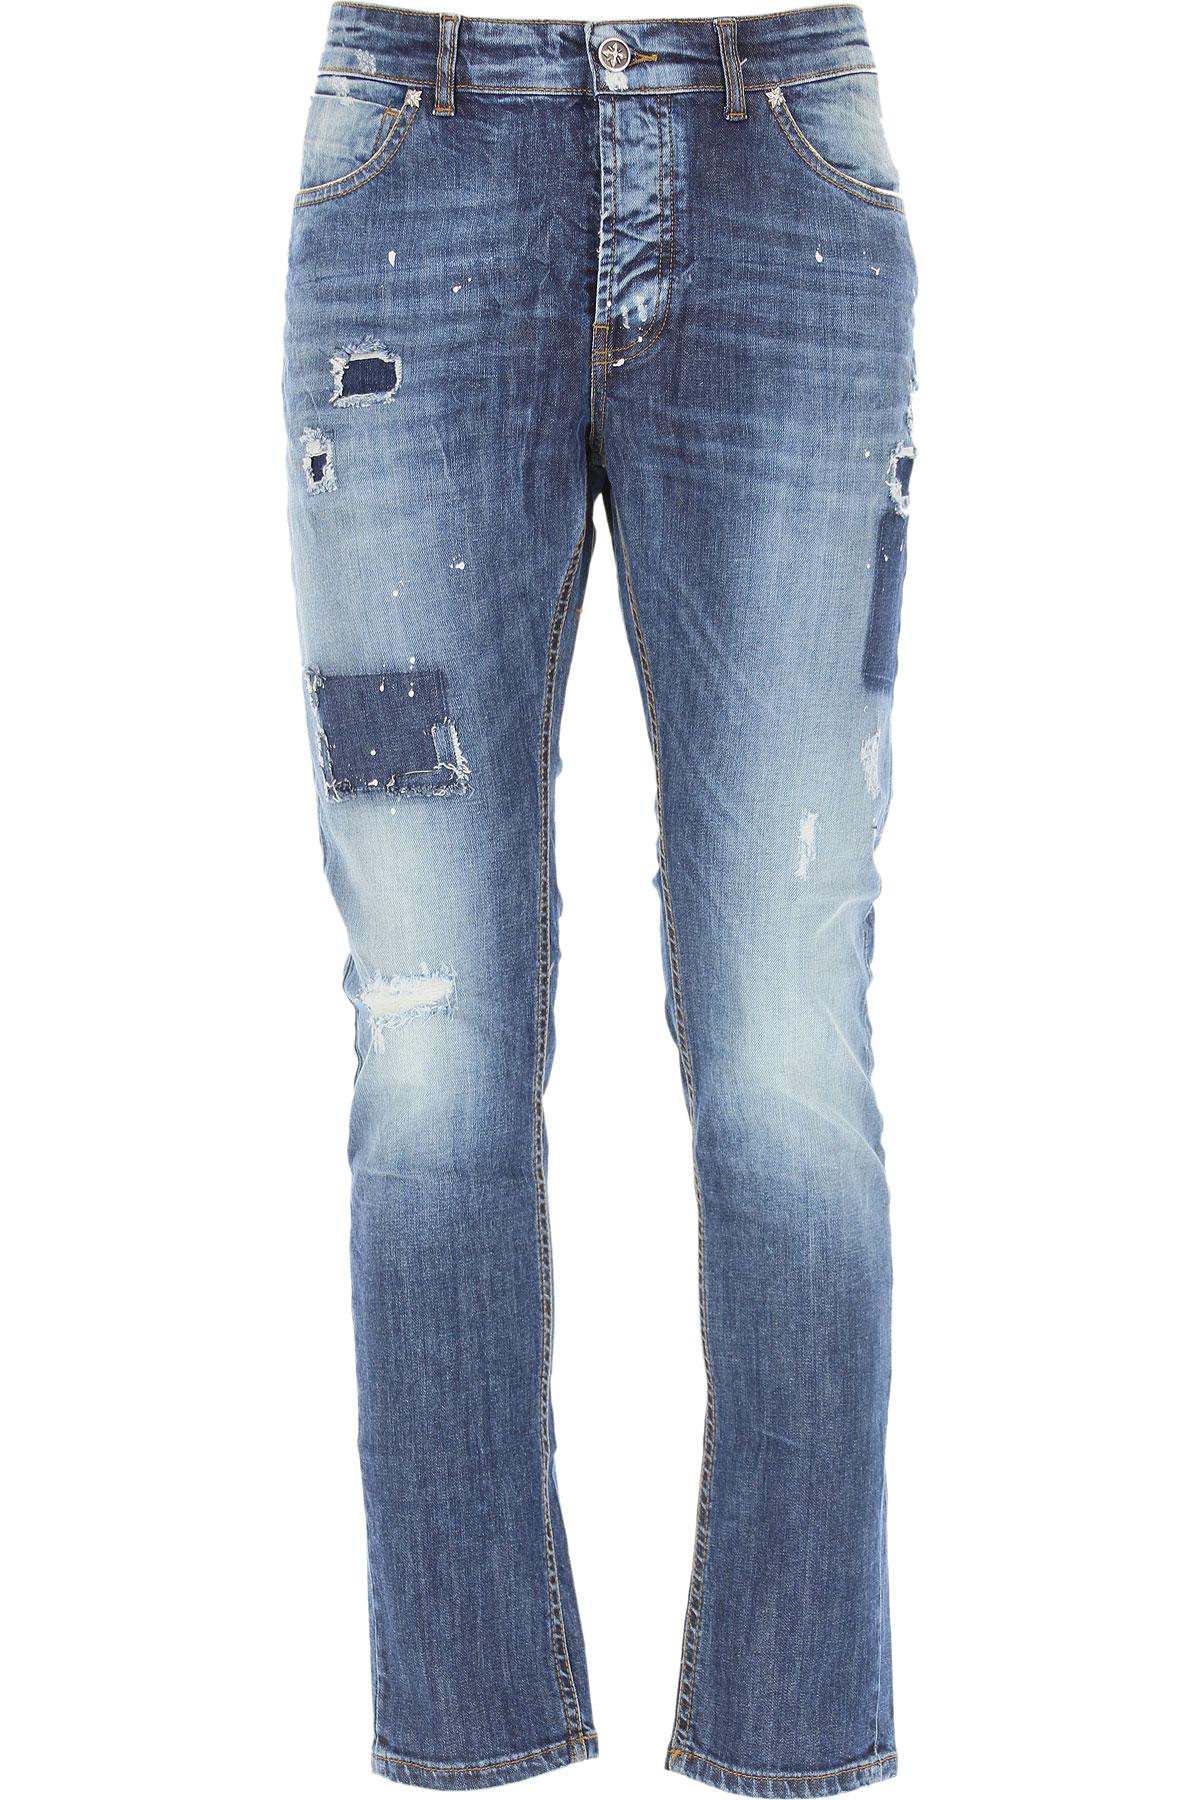 John Richmond Jeans On Sale, Denim Blue, Cotton, 2019, 32 33 34 36